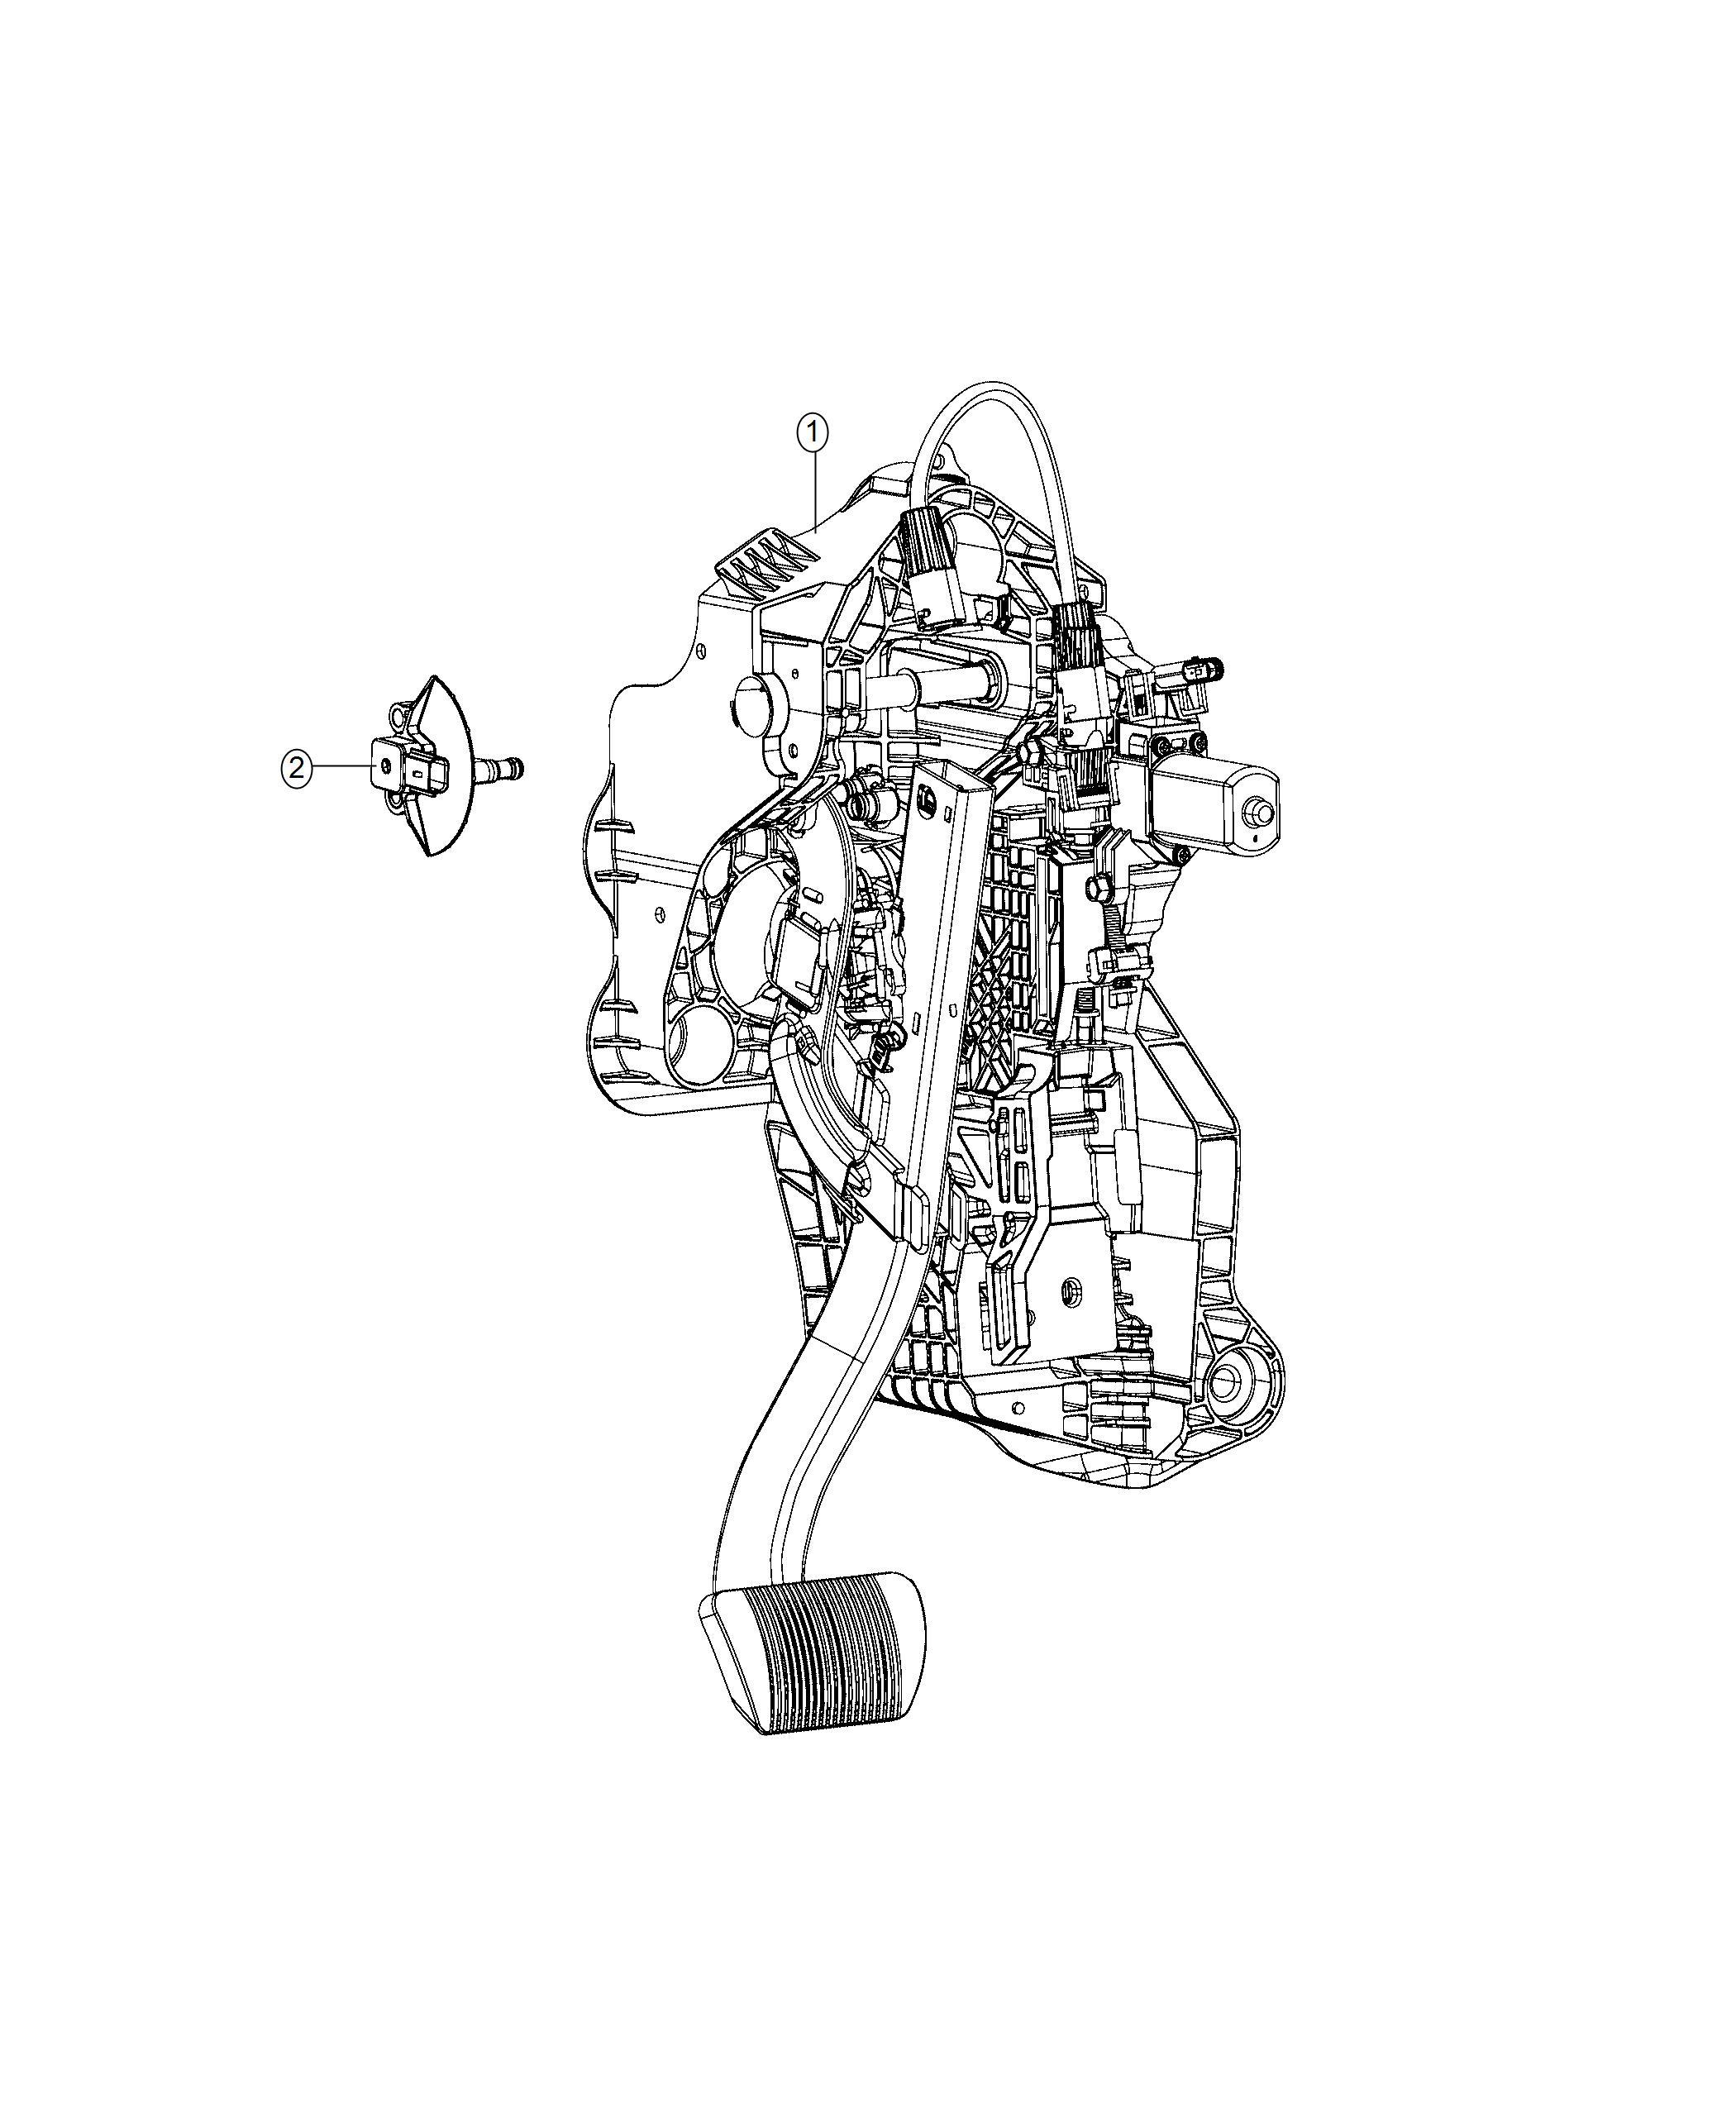 Ram 1500 Sensor. Brake pedal. [power adjustable pedals w